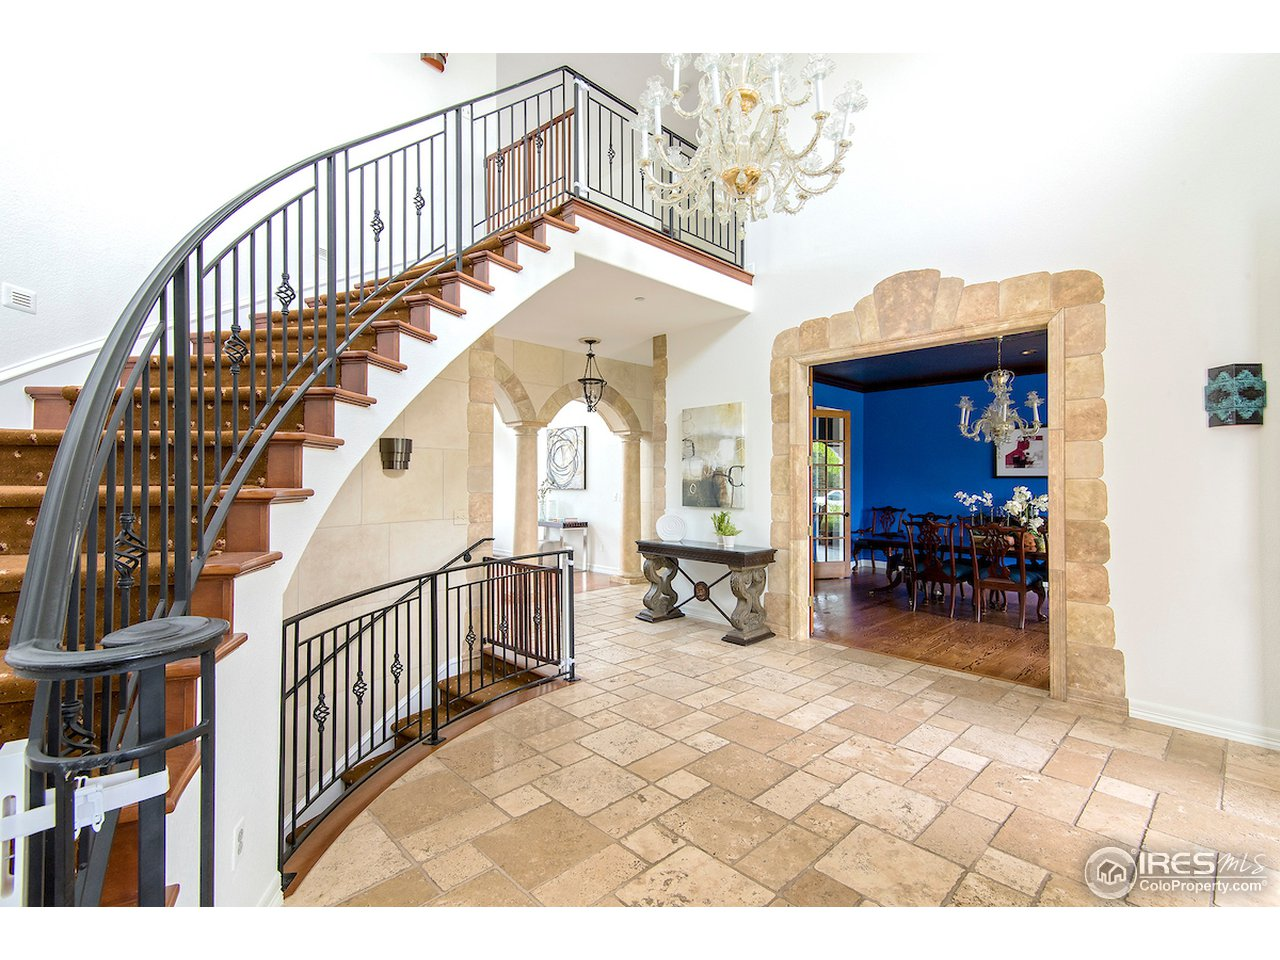 Classic, elegant staircase.